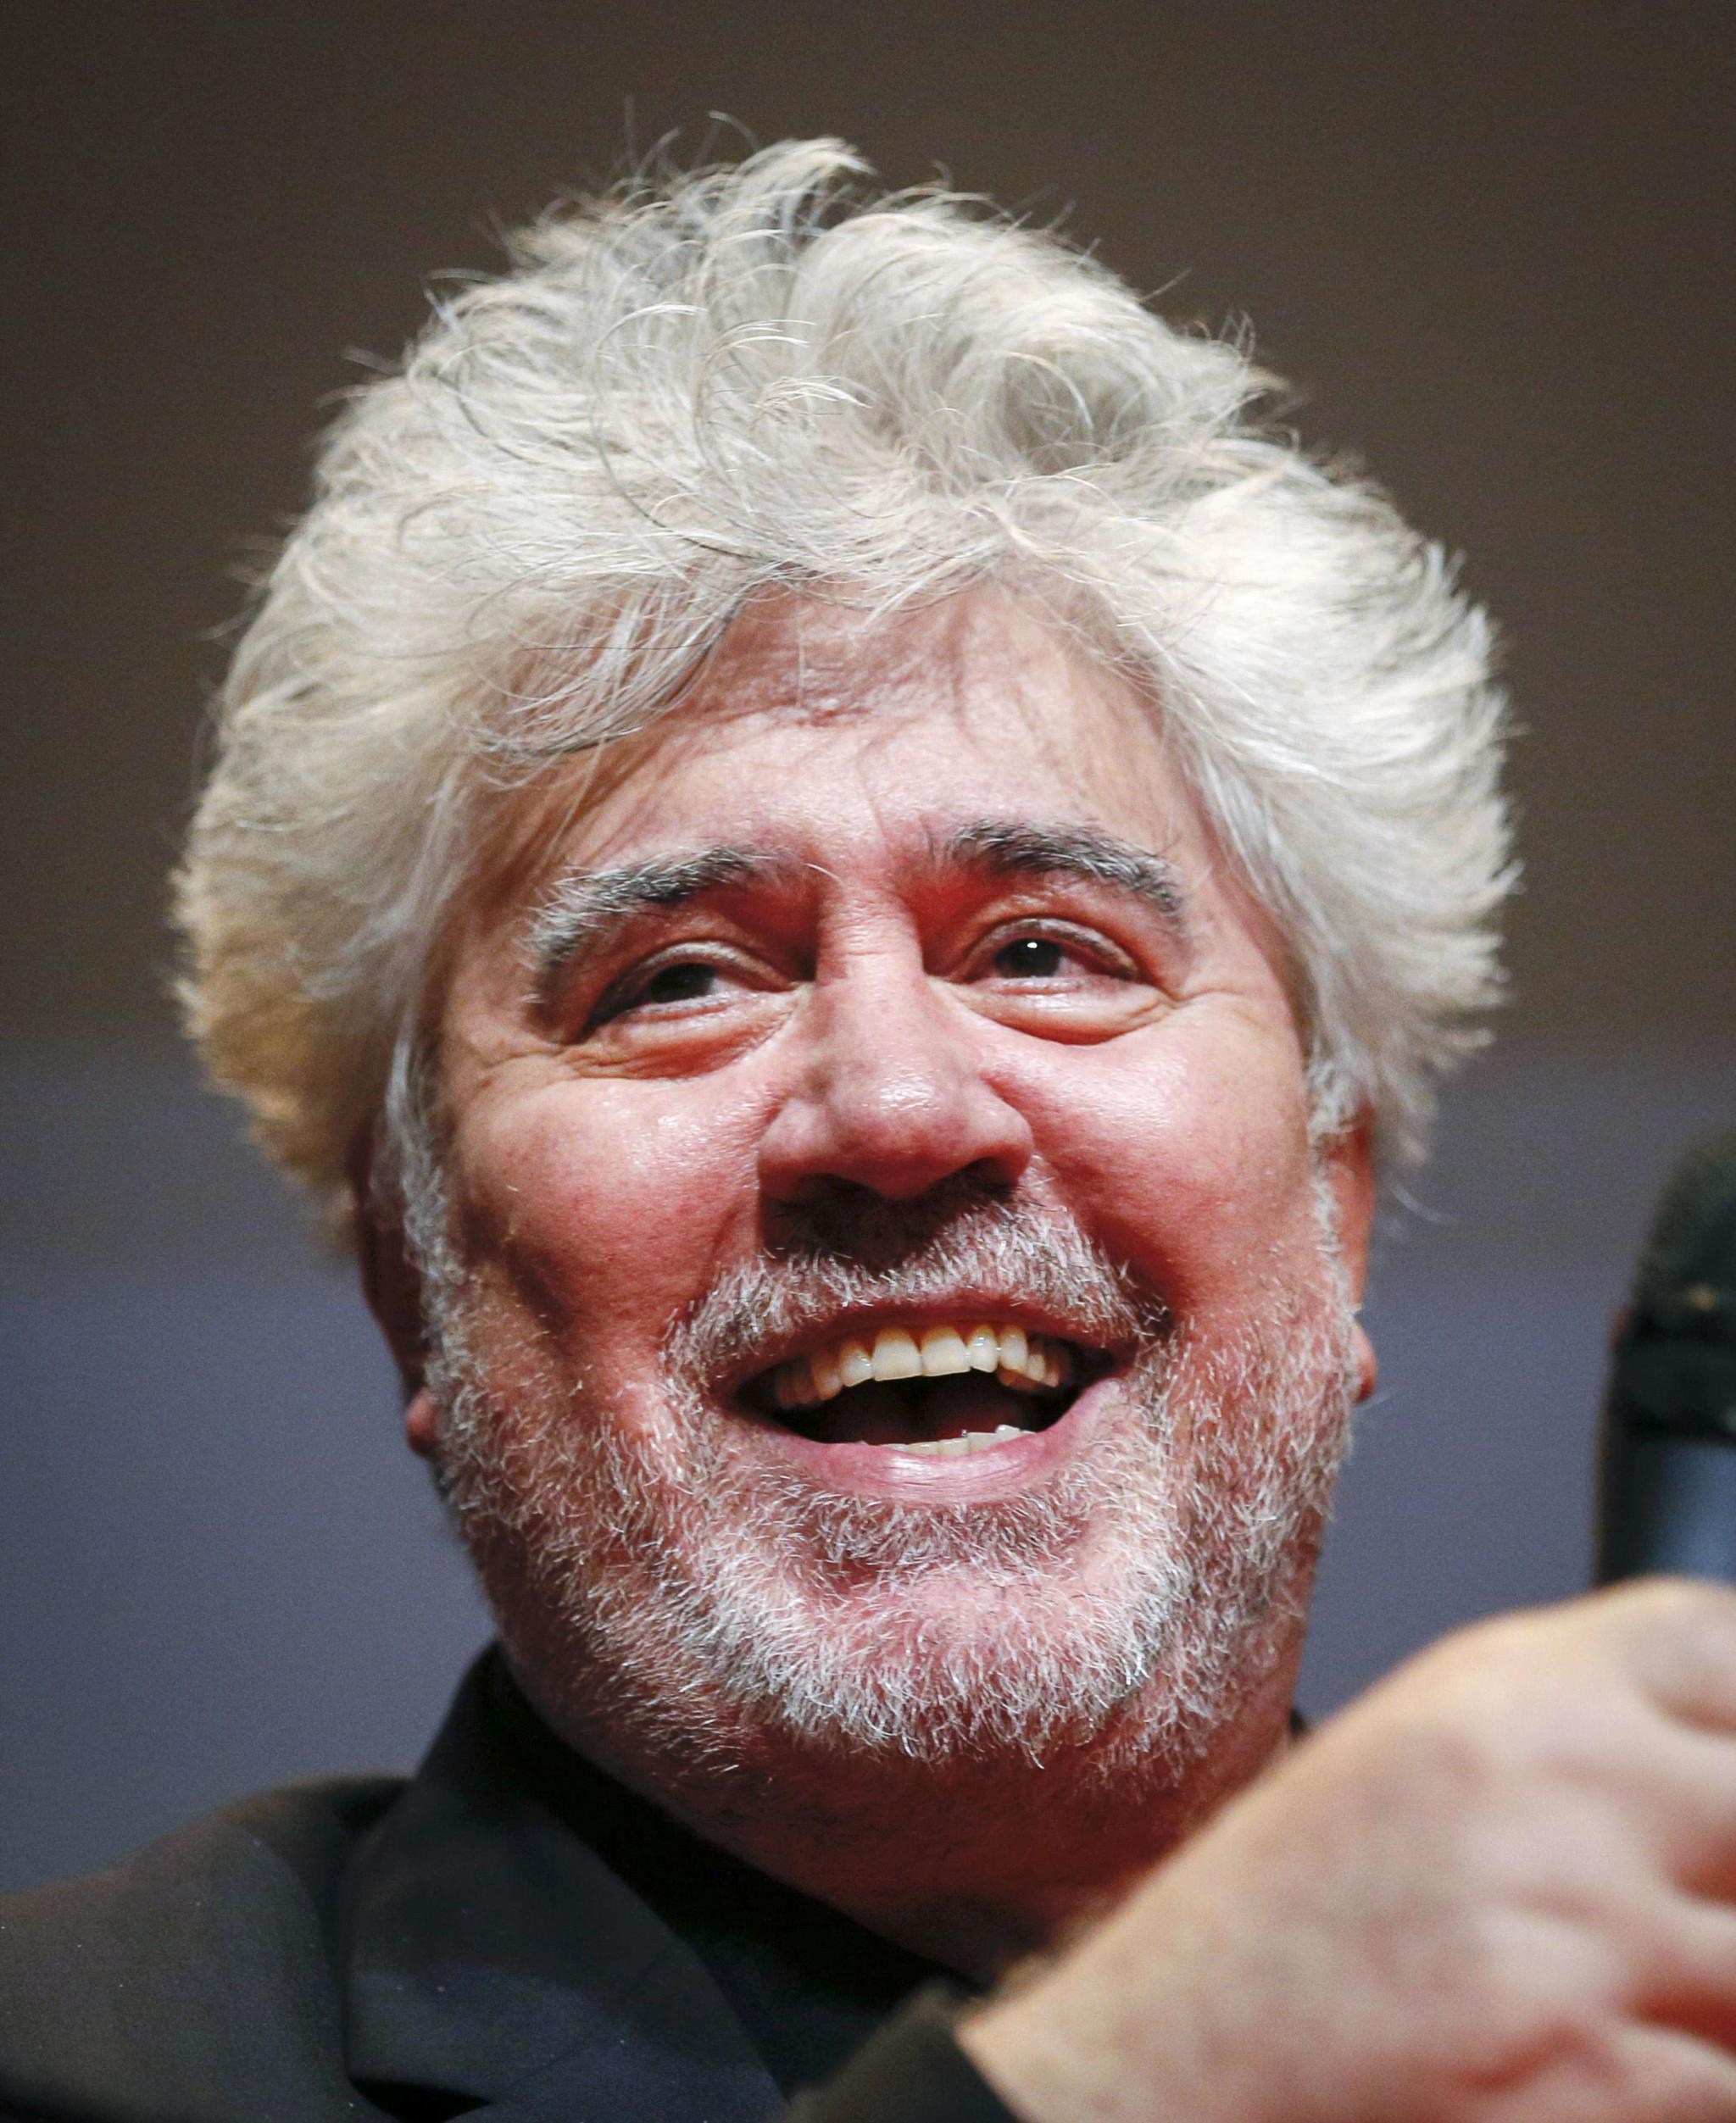 PÚBLICO - Almodóvar preside ao júri do Festival de Cannes